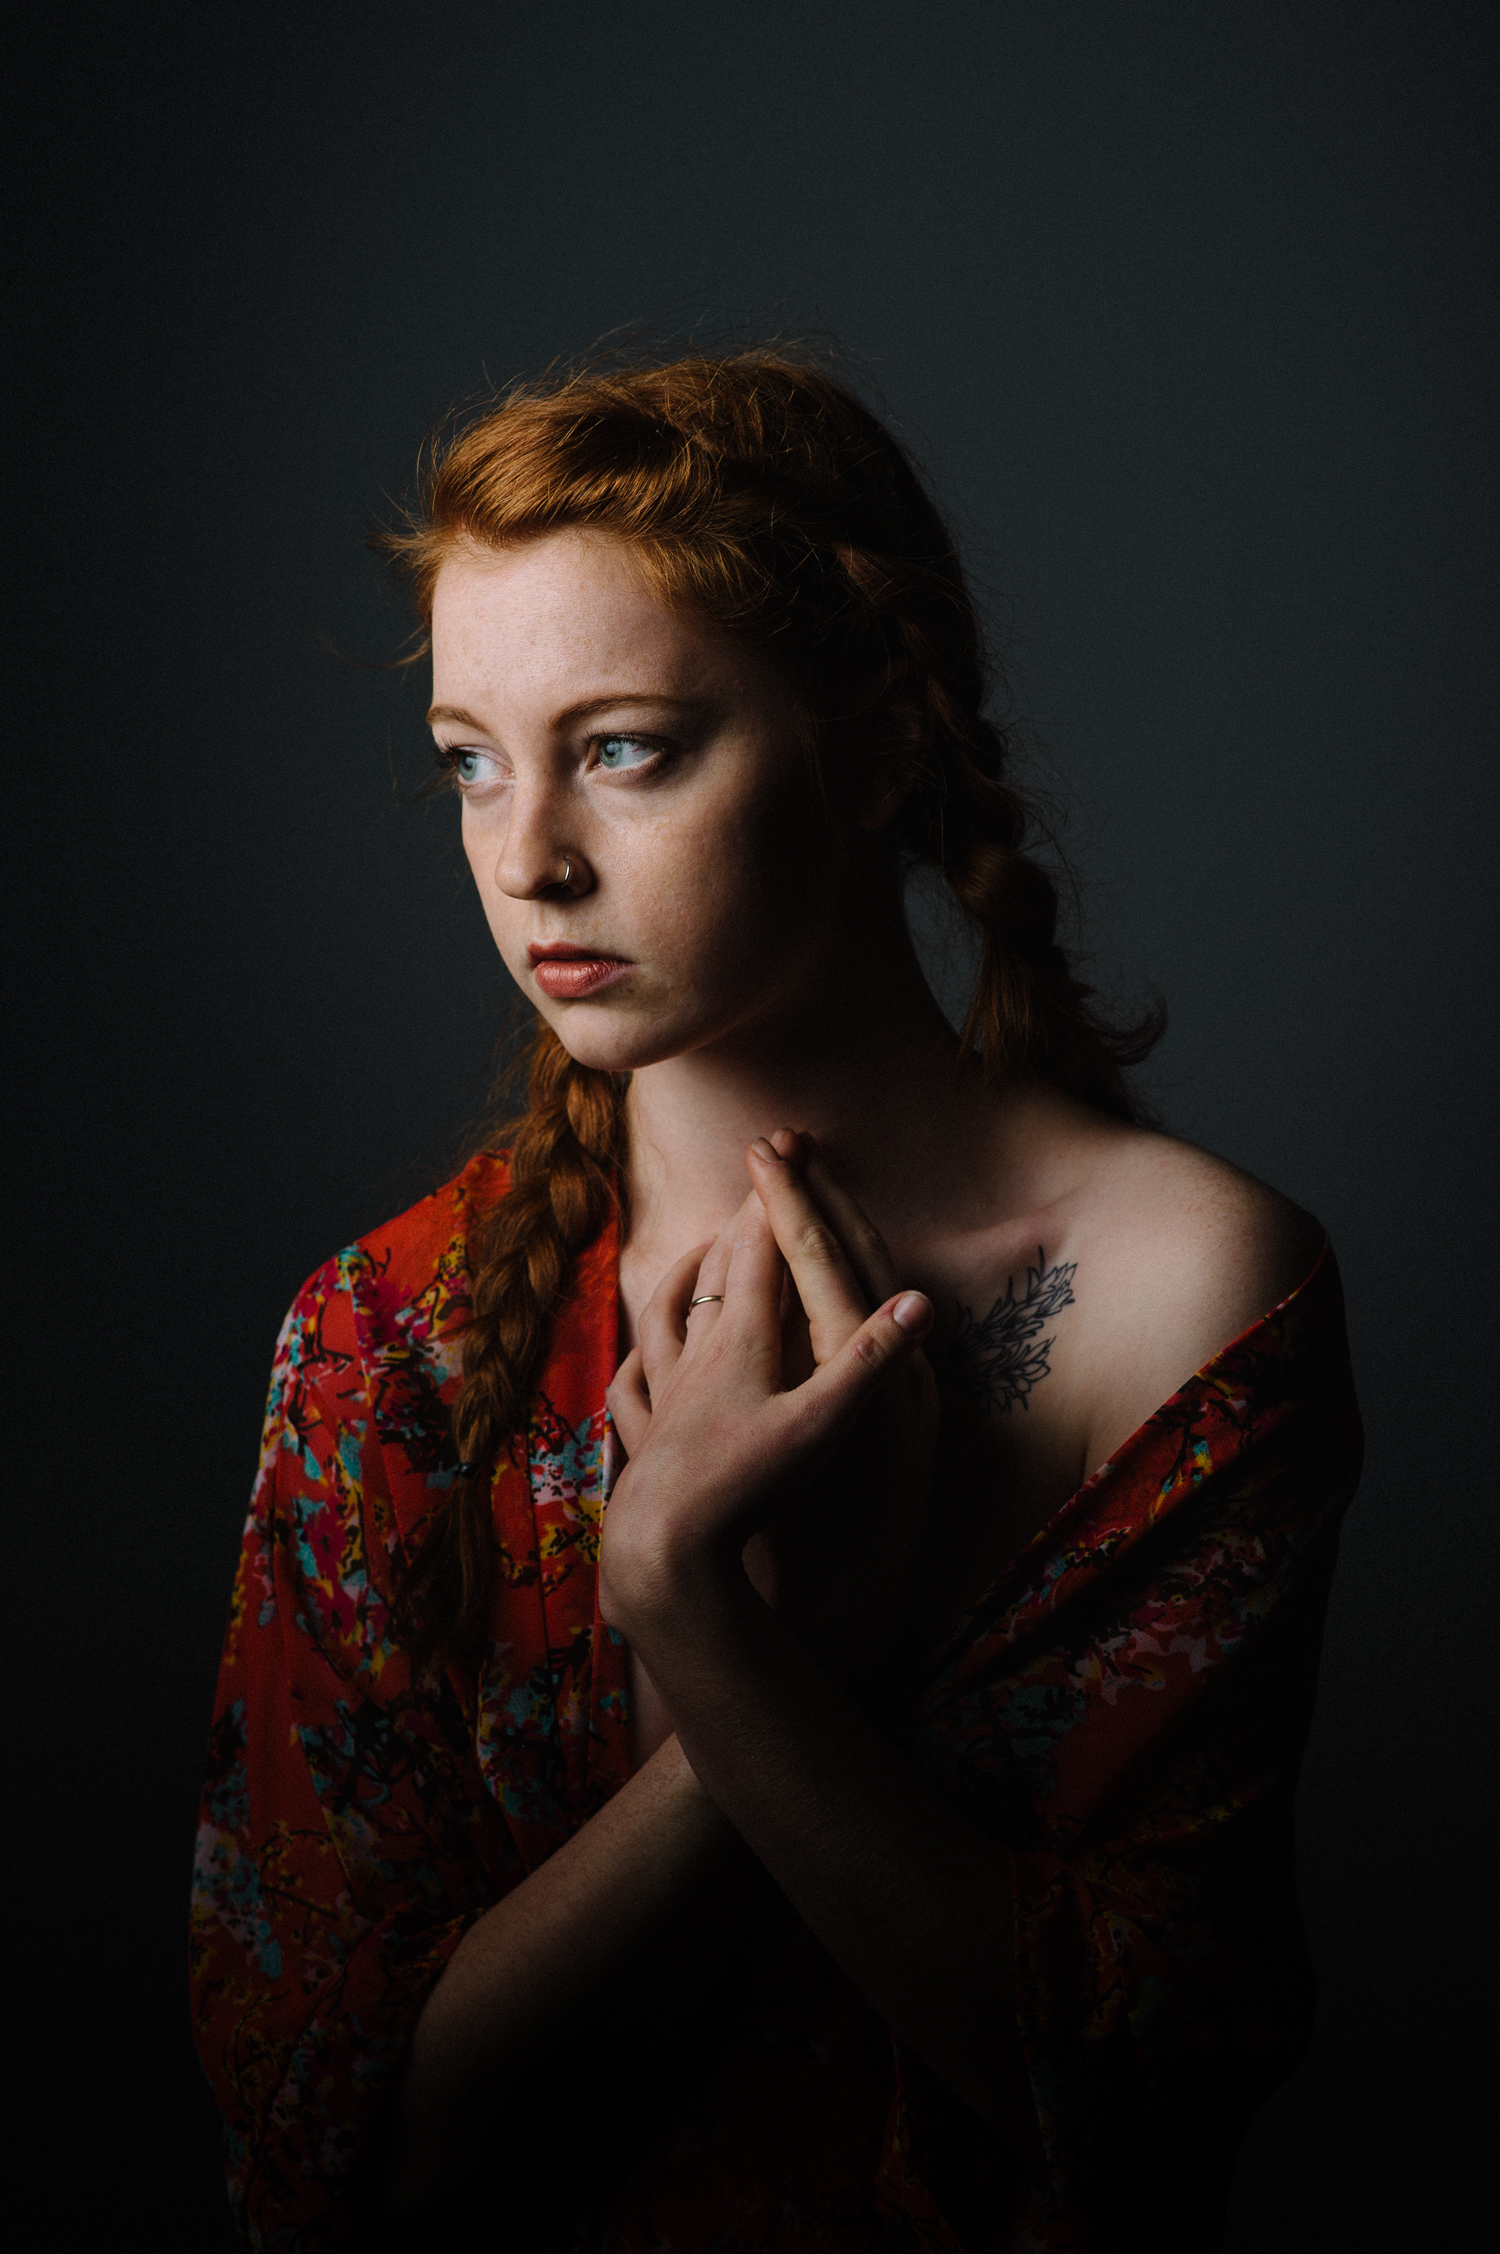 cady-studio-portraits-7856.jpg